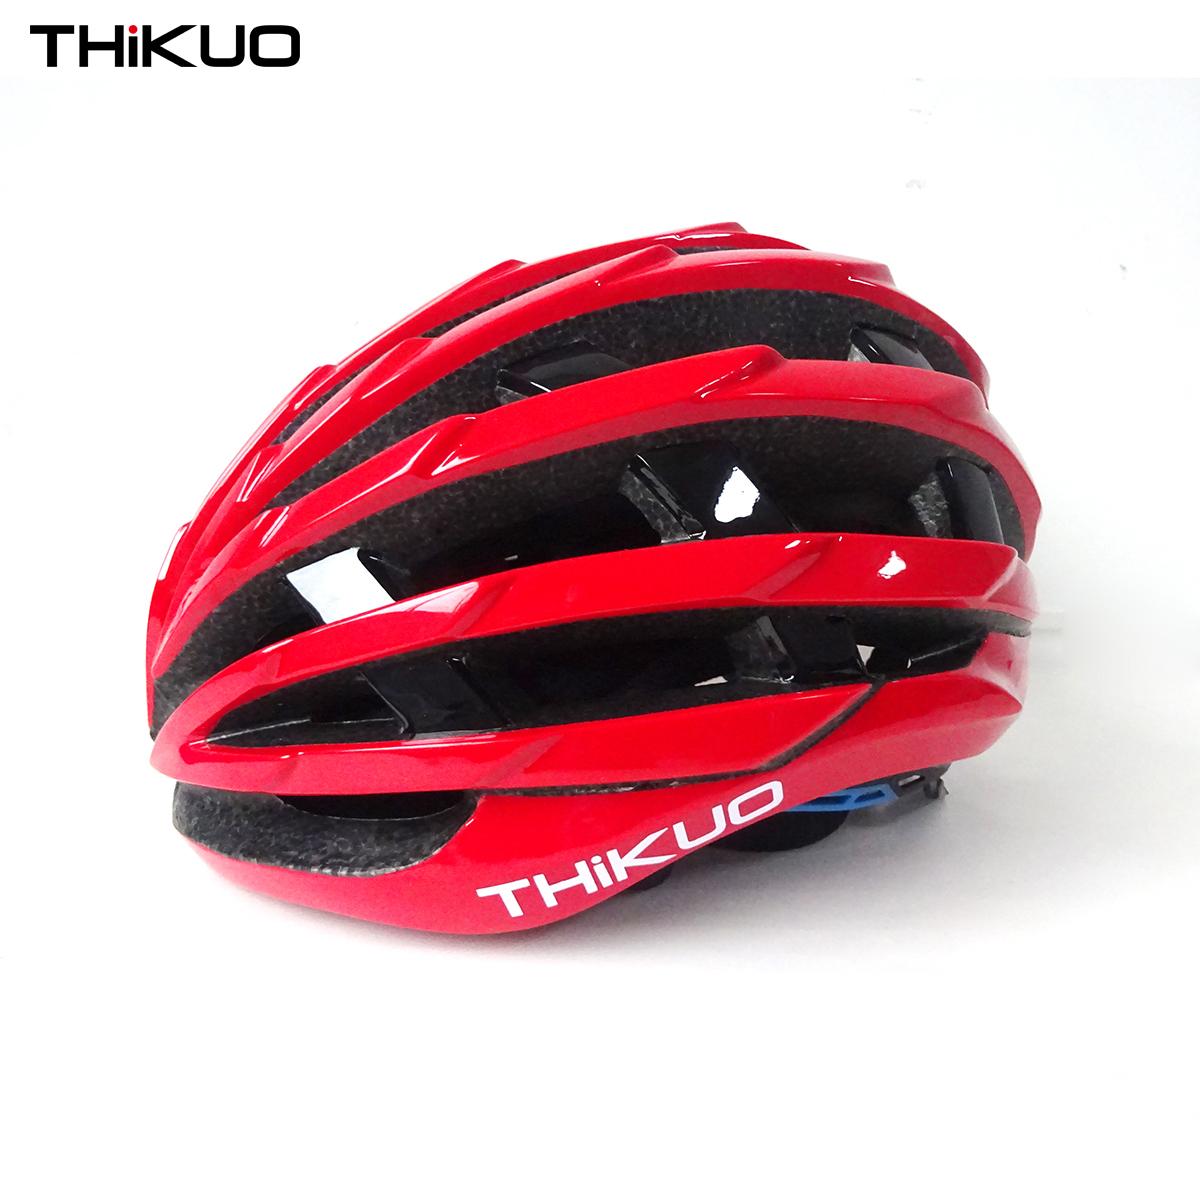 Hedgehog shape bicycle one-piece helmet light weight road bike wemen cycling helmets TH-760 0